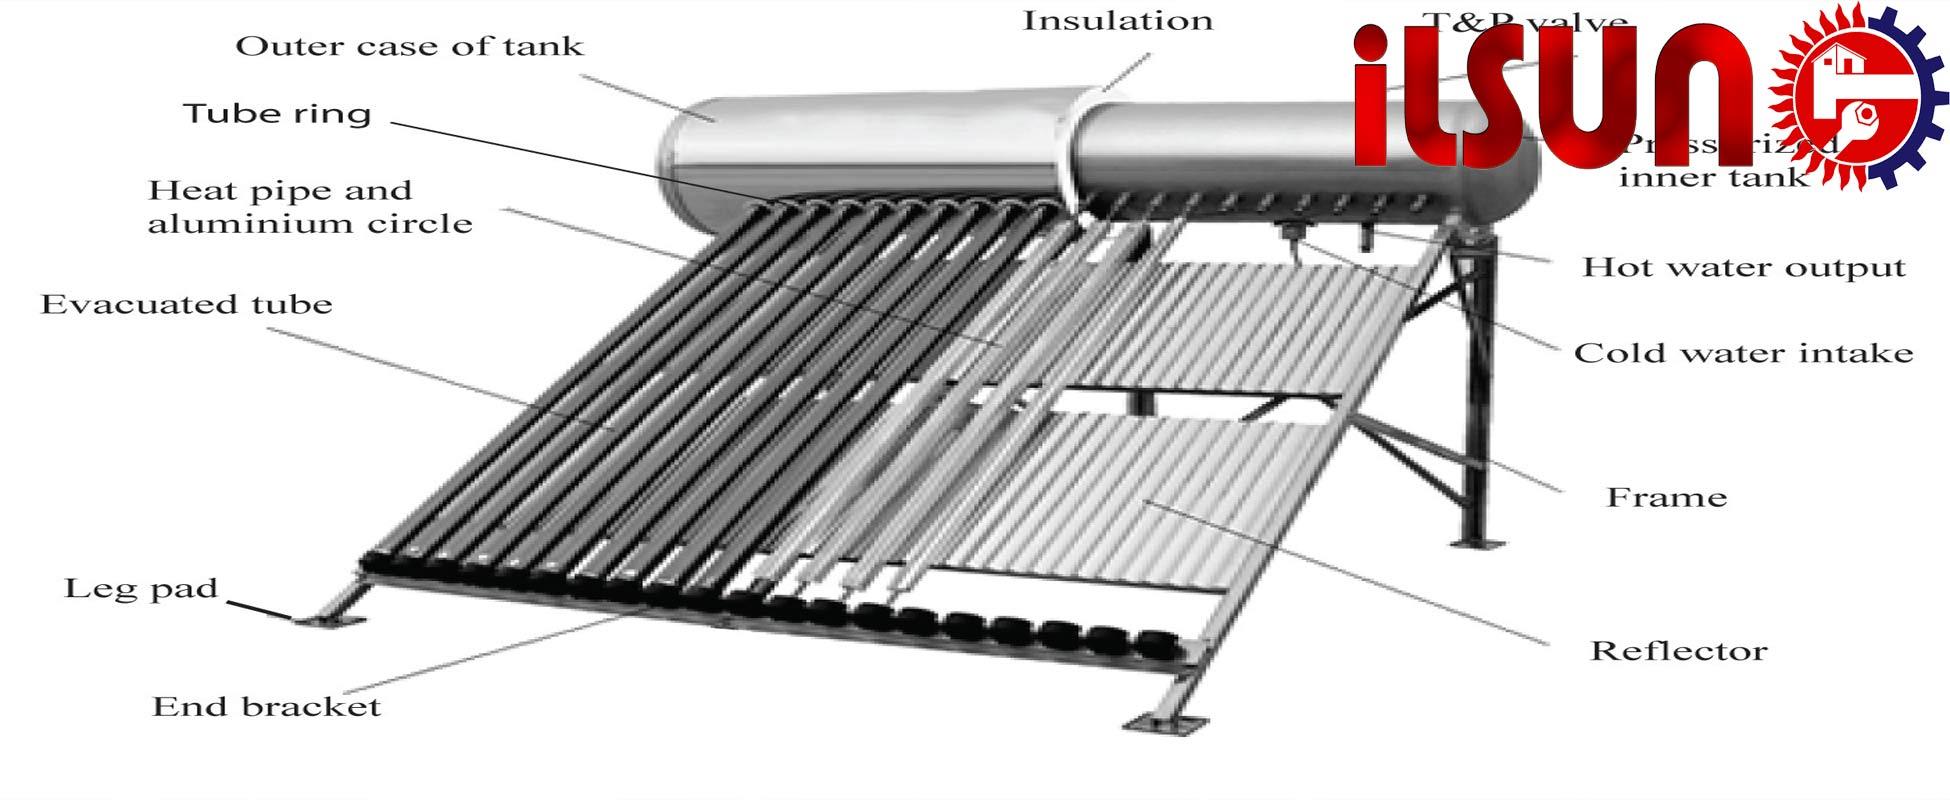 آبگرمکن خورشیدی چقدر عمر می کند؟